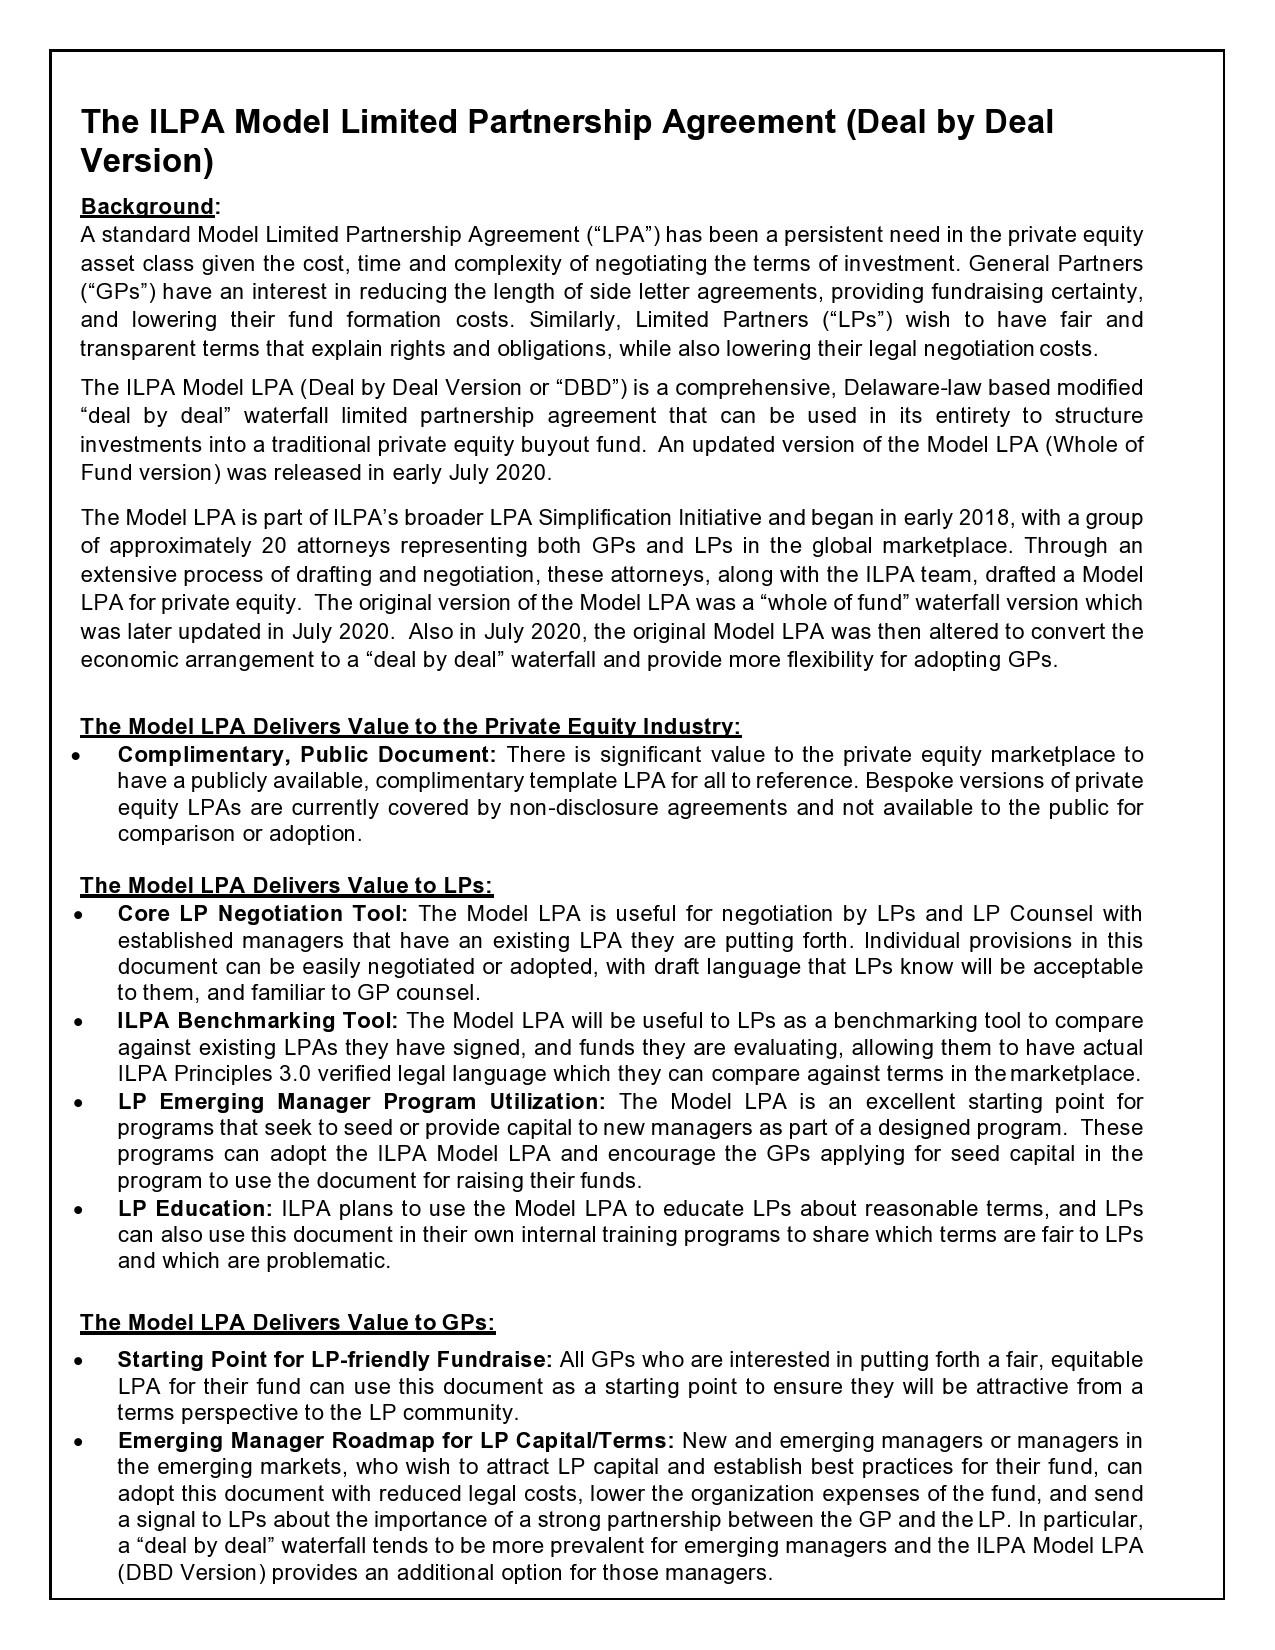 Free limited partnership agreement 23